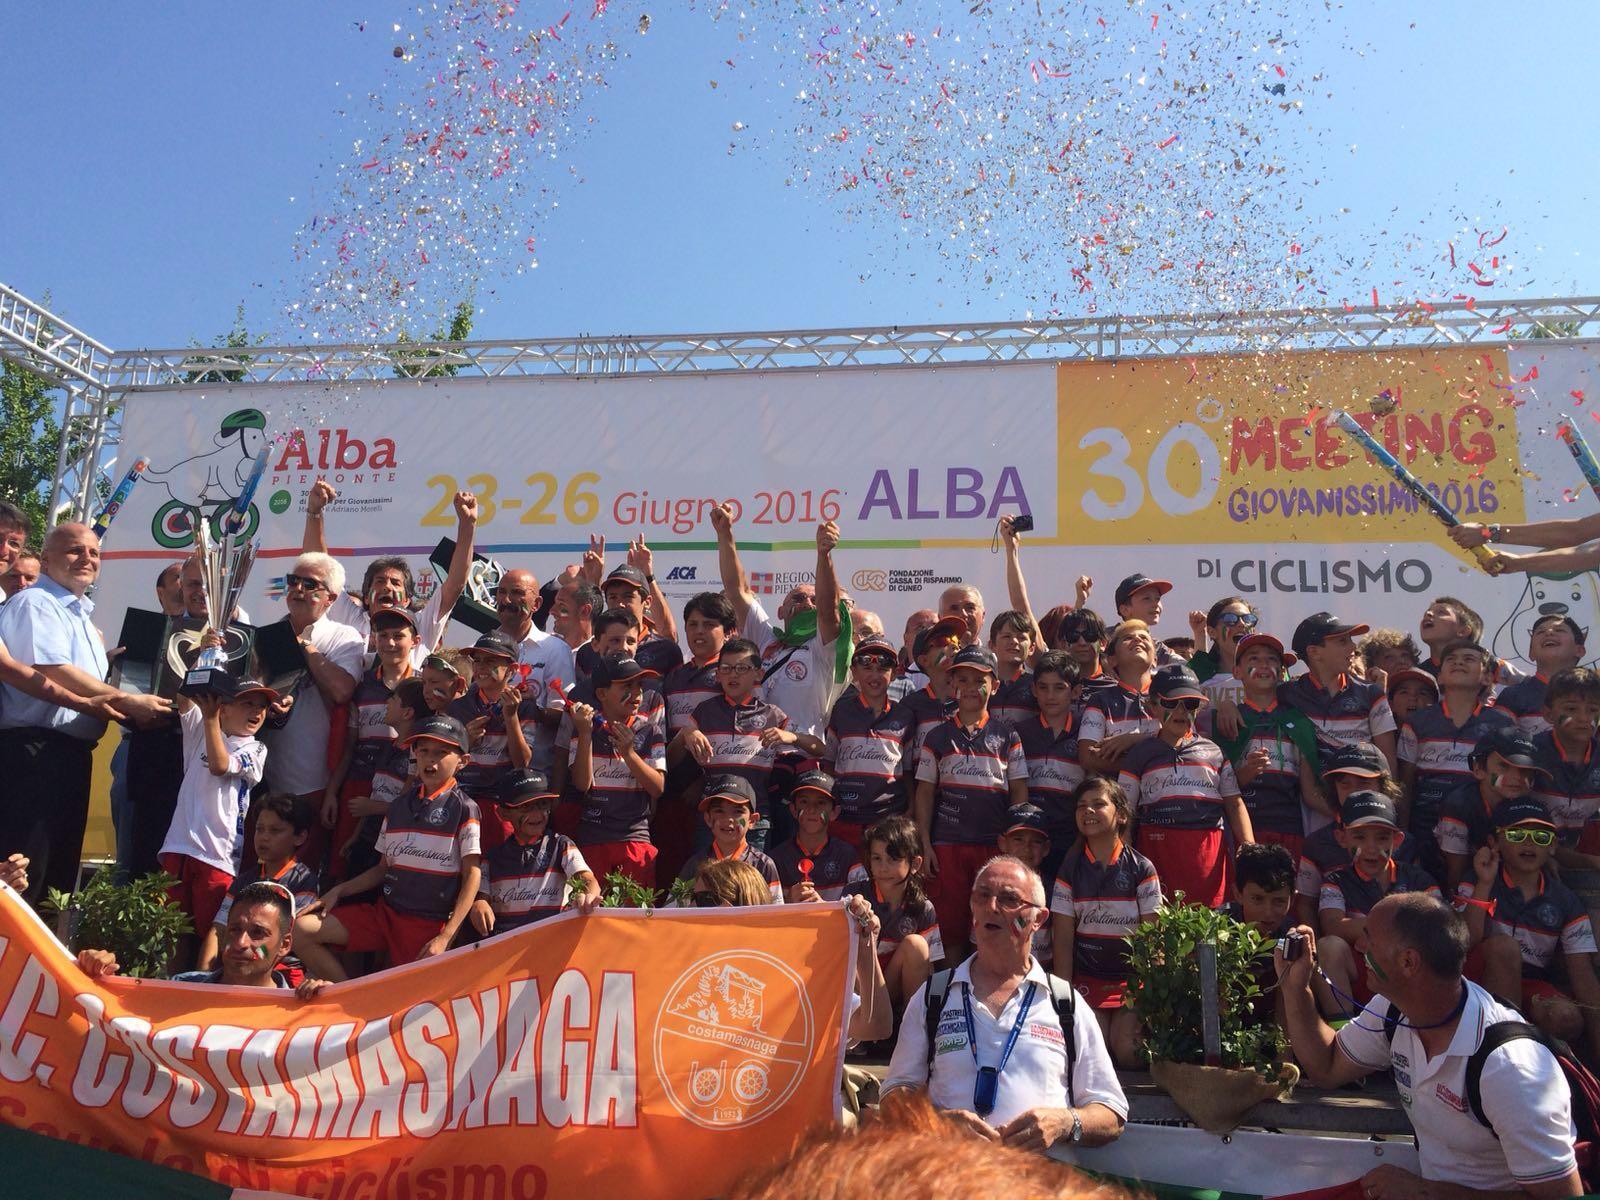 L'Uc Costamasnaga vince il Meeting Giovanissimi di Alba